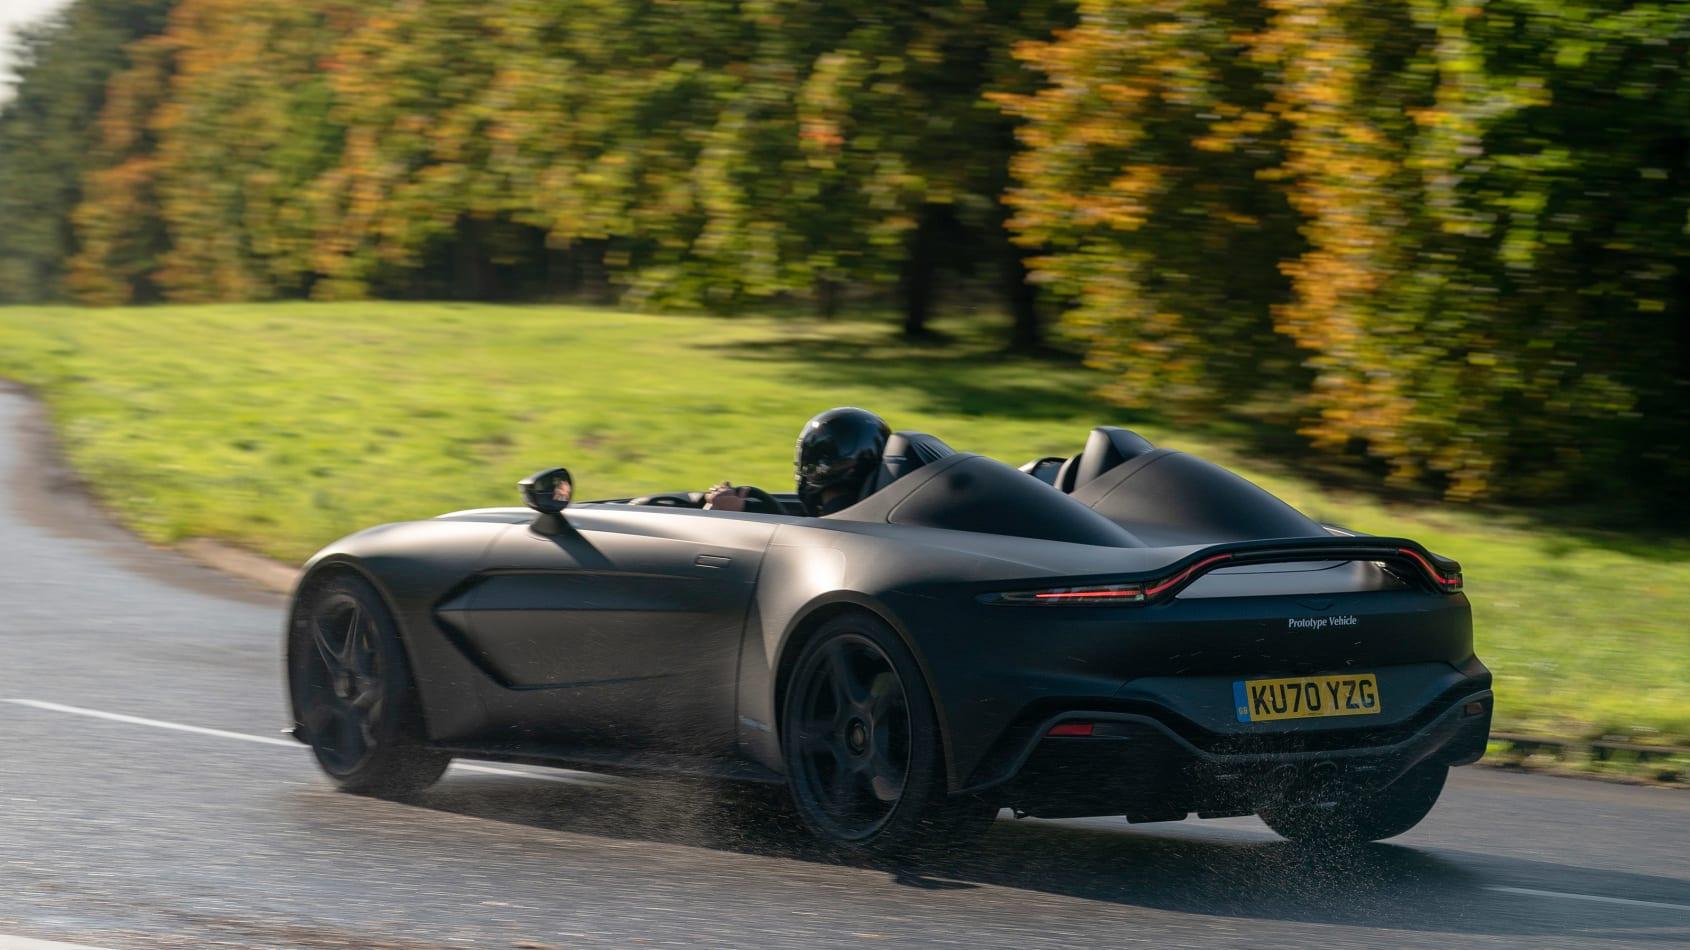 Aston_Martin_V12_Speedster_prototype_0005